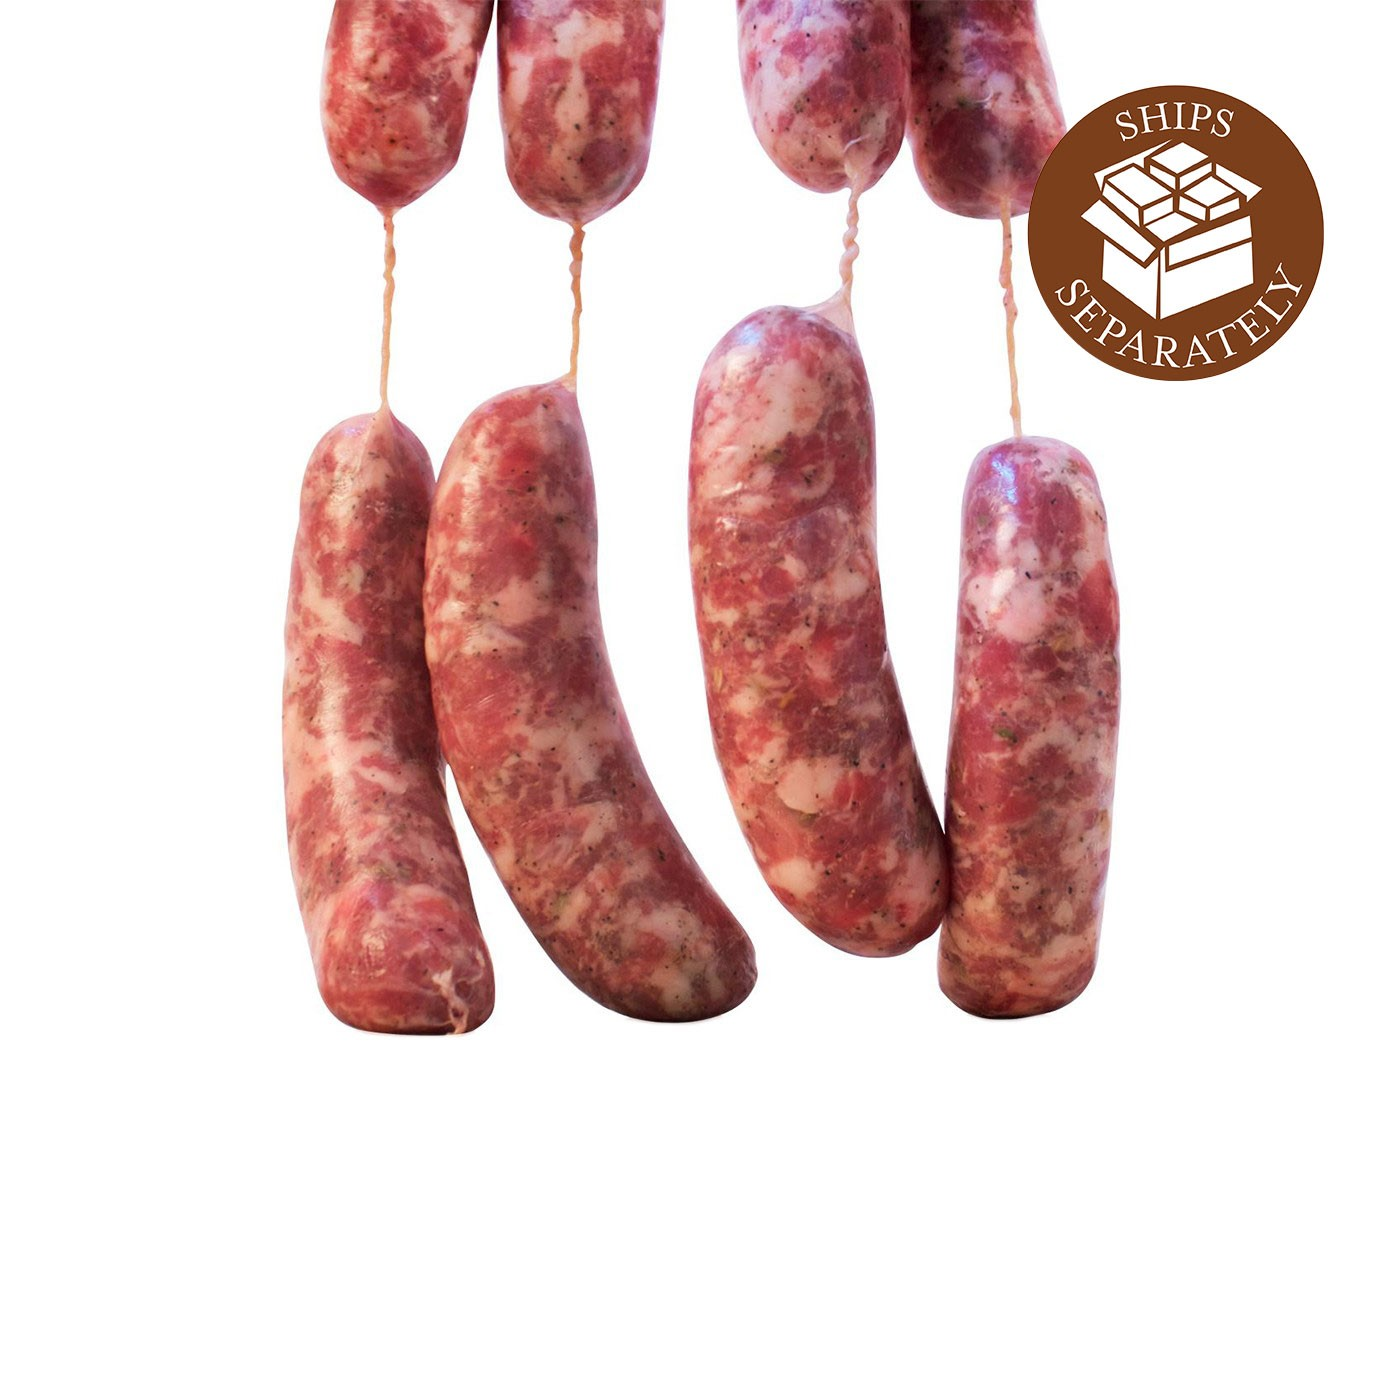 Sweet Sausage 3-lb Package